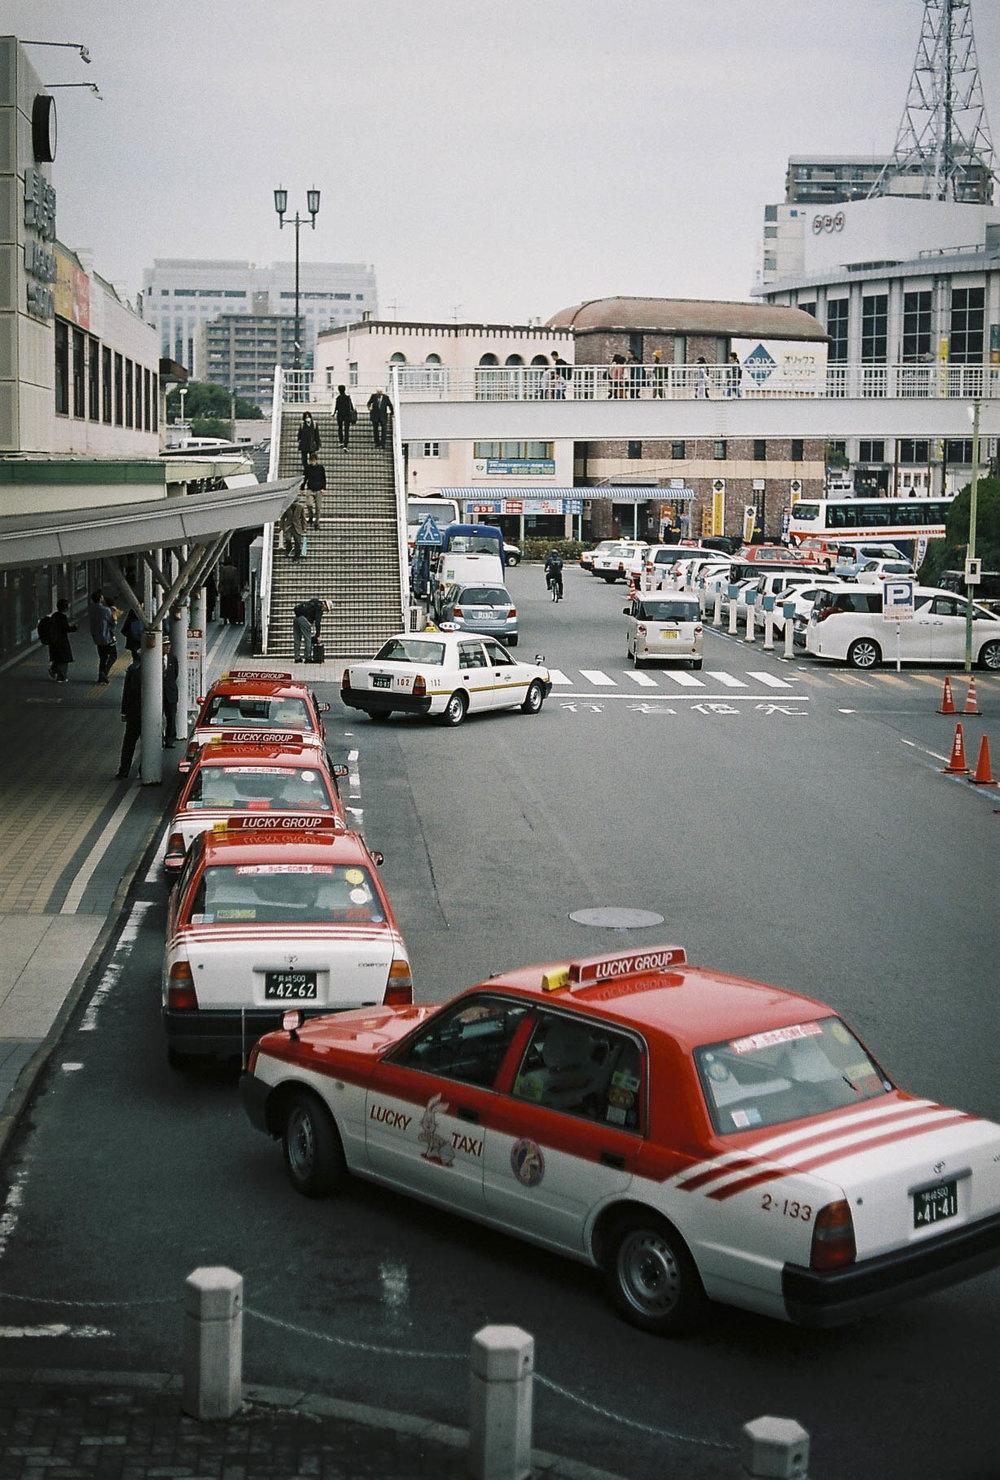 BDAY_LA_JAPAN_SNAP_LQ_175.JPG